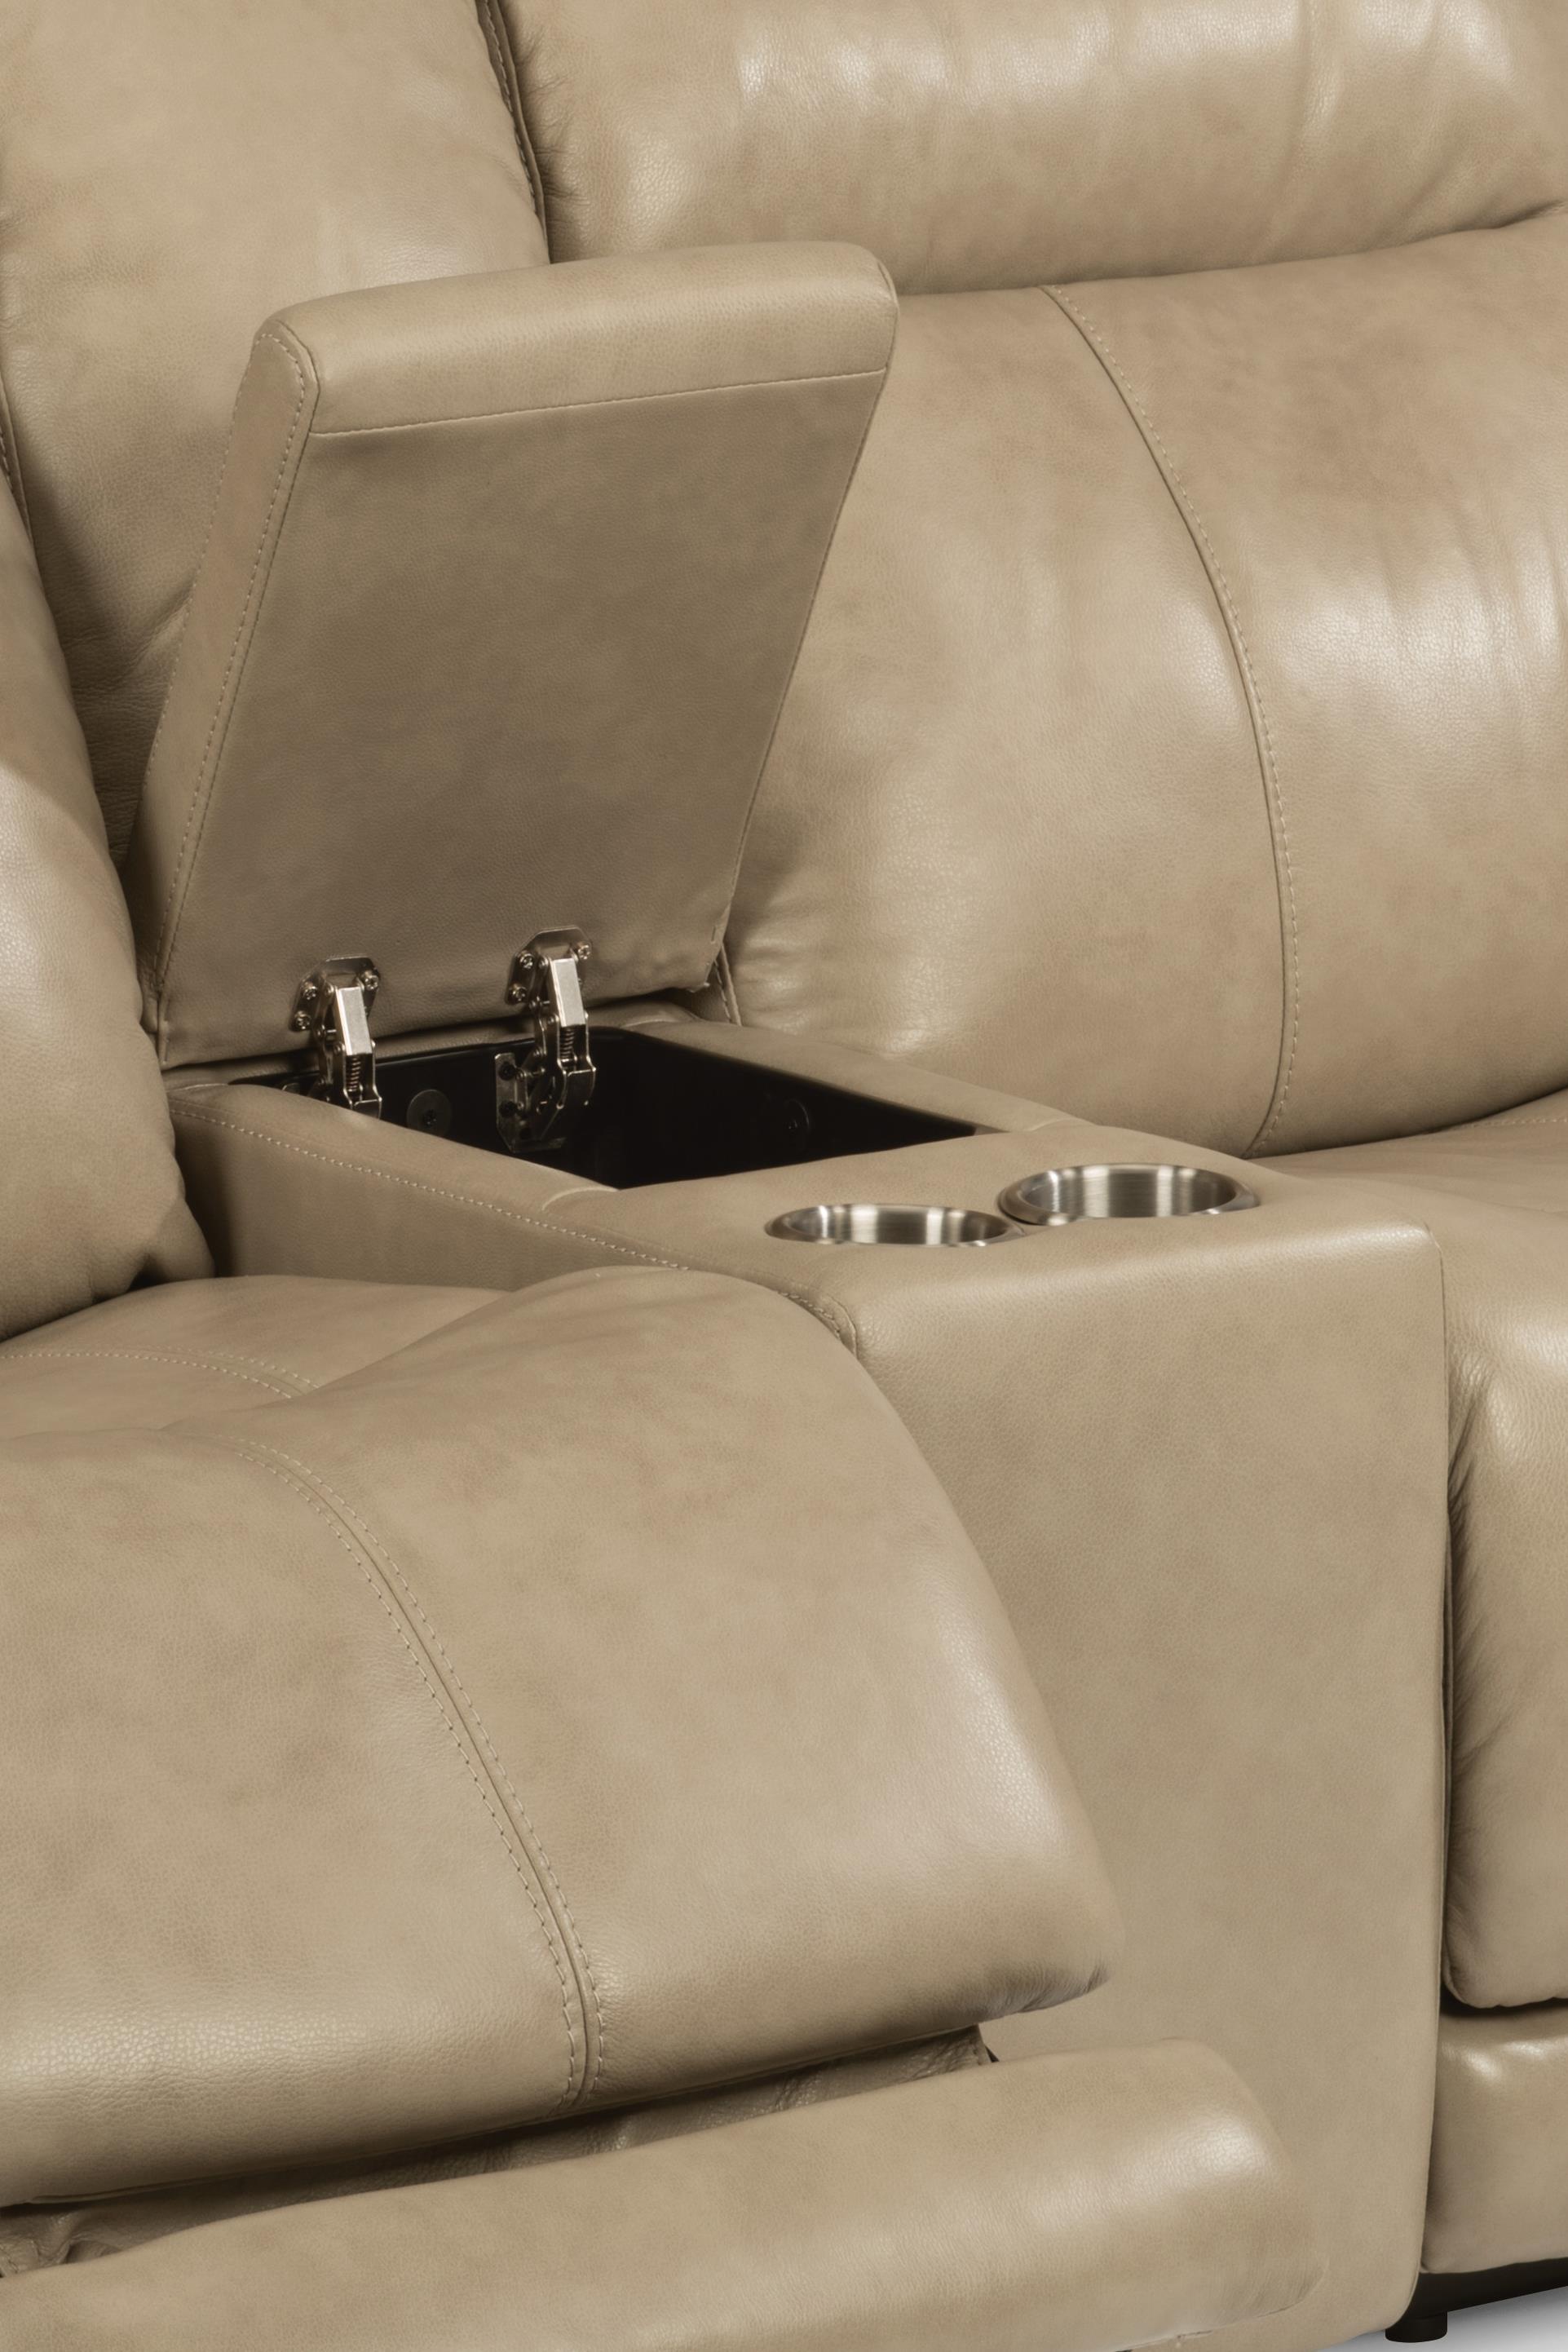 Phenomenal Latitudes Miller 1729 By Flexsteel Rooms And Rest Inzonedesignstudio Interior Chair Design Inzonedesignstudiocom